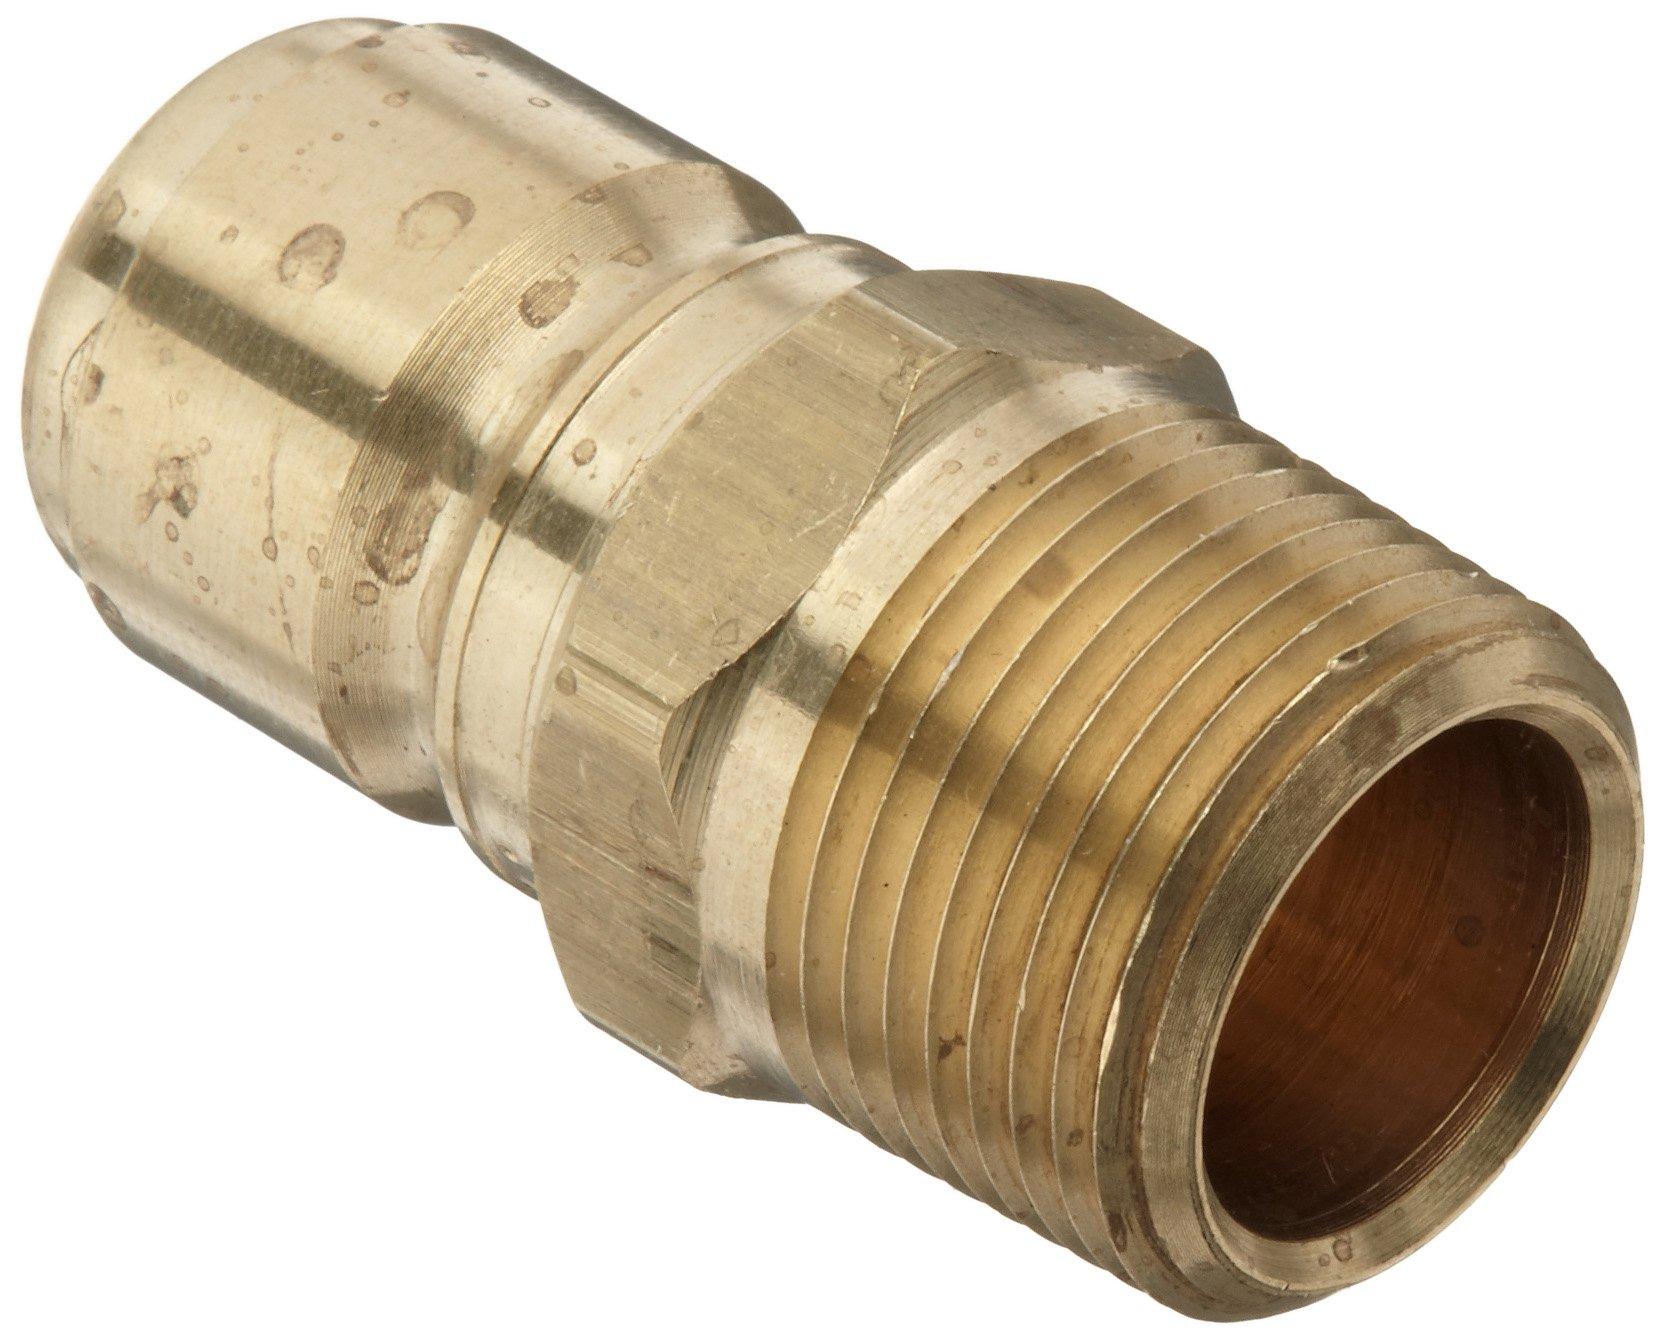 Dixon STMP6B Brass Hydraulic Quick-Connect Fitting, Plug, 3/4'' Male Coupler x 3/4''-14 NPT